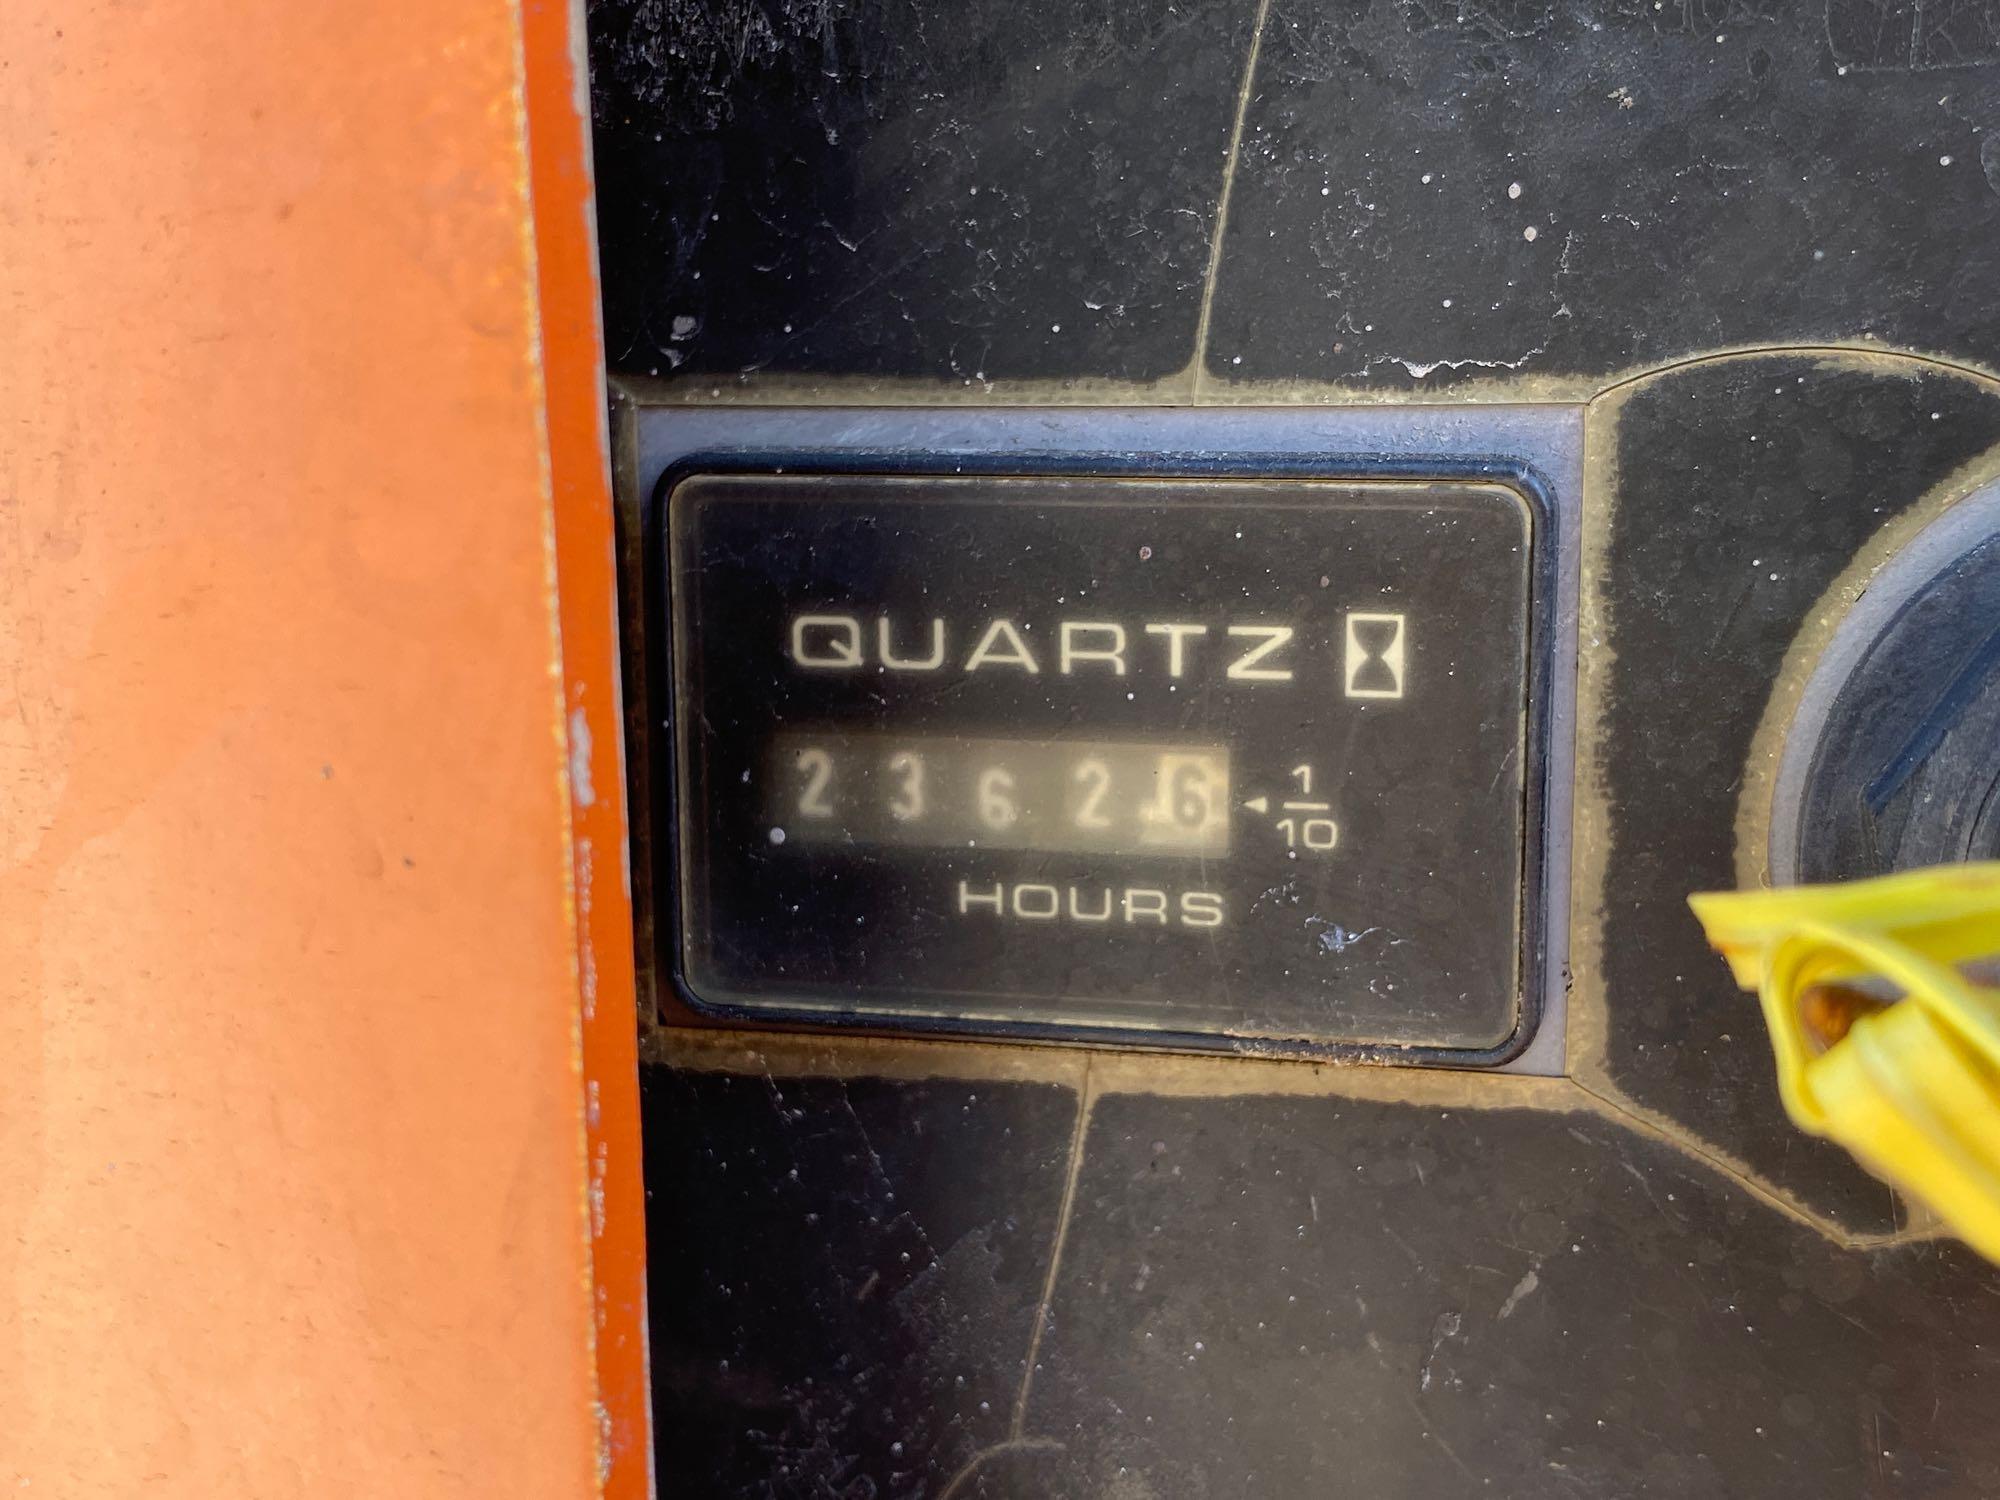 Lot 13 - JLG 450AARTICULATING BOOM LIFT, DIESEL POWERED, 45' PLATFORM HEIGHT, RUNS & OPERATES